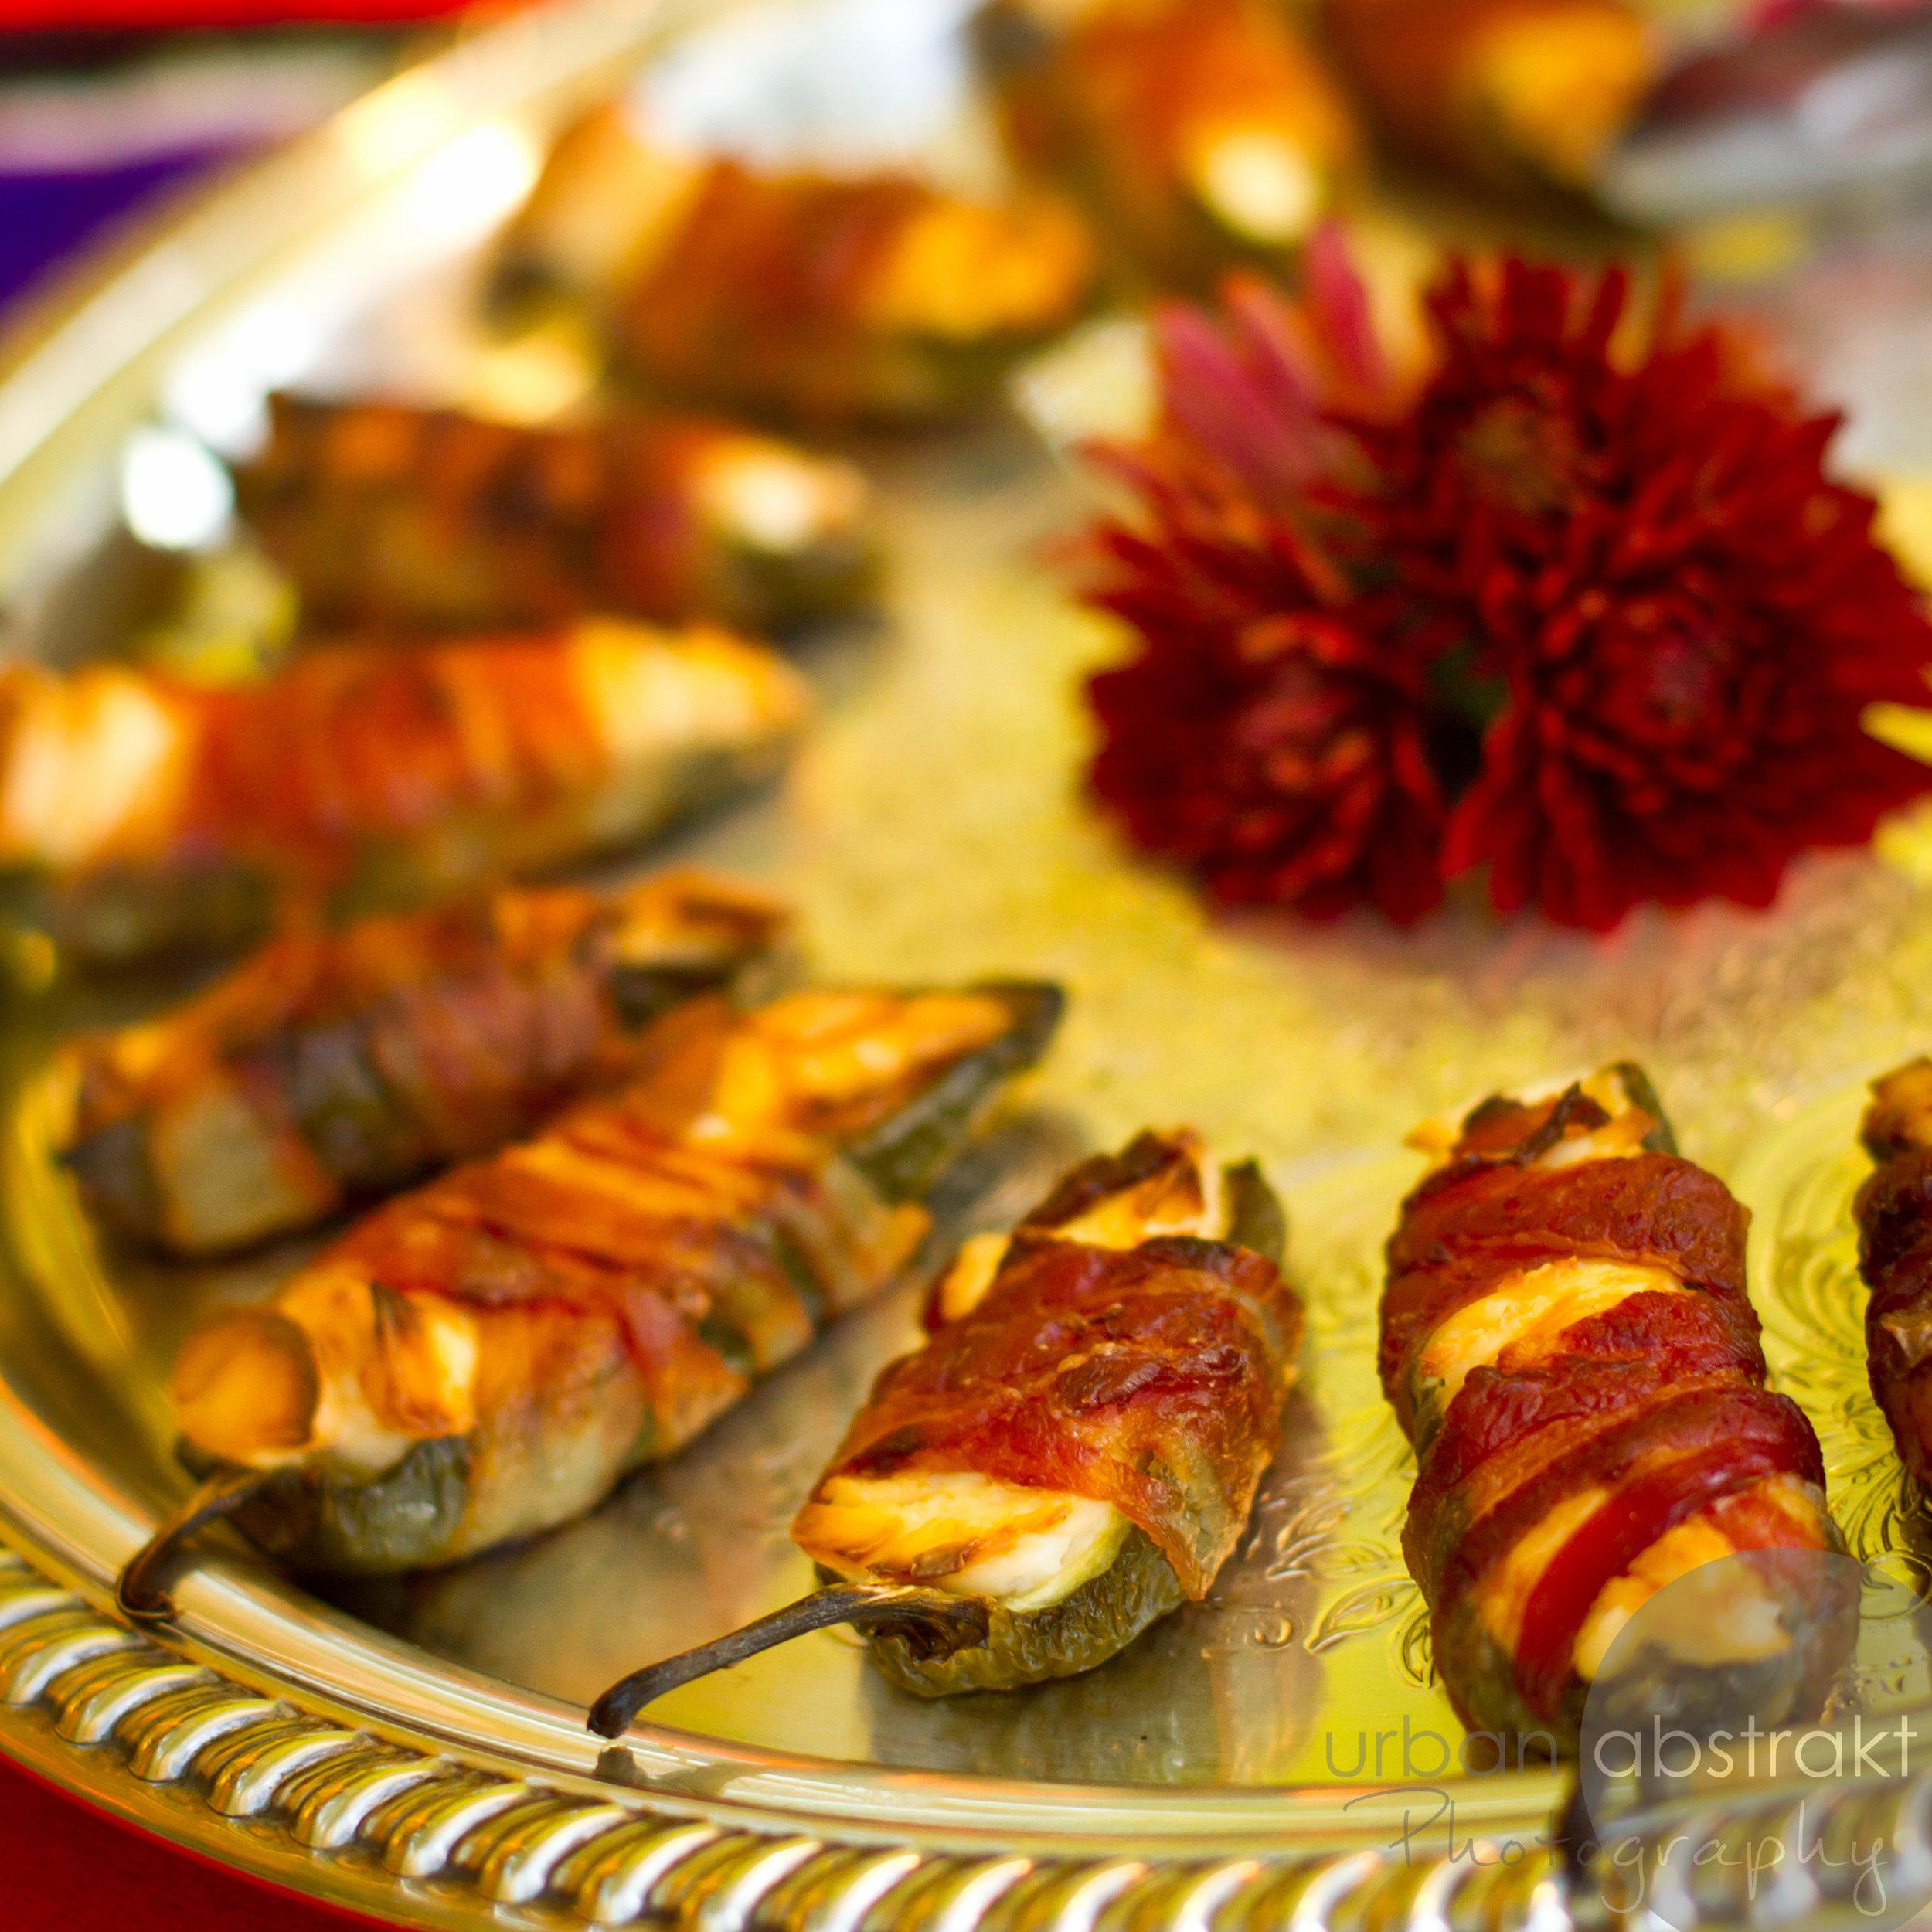 jalapeno wrapped food image